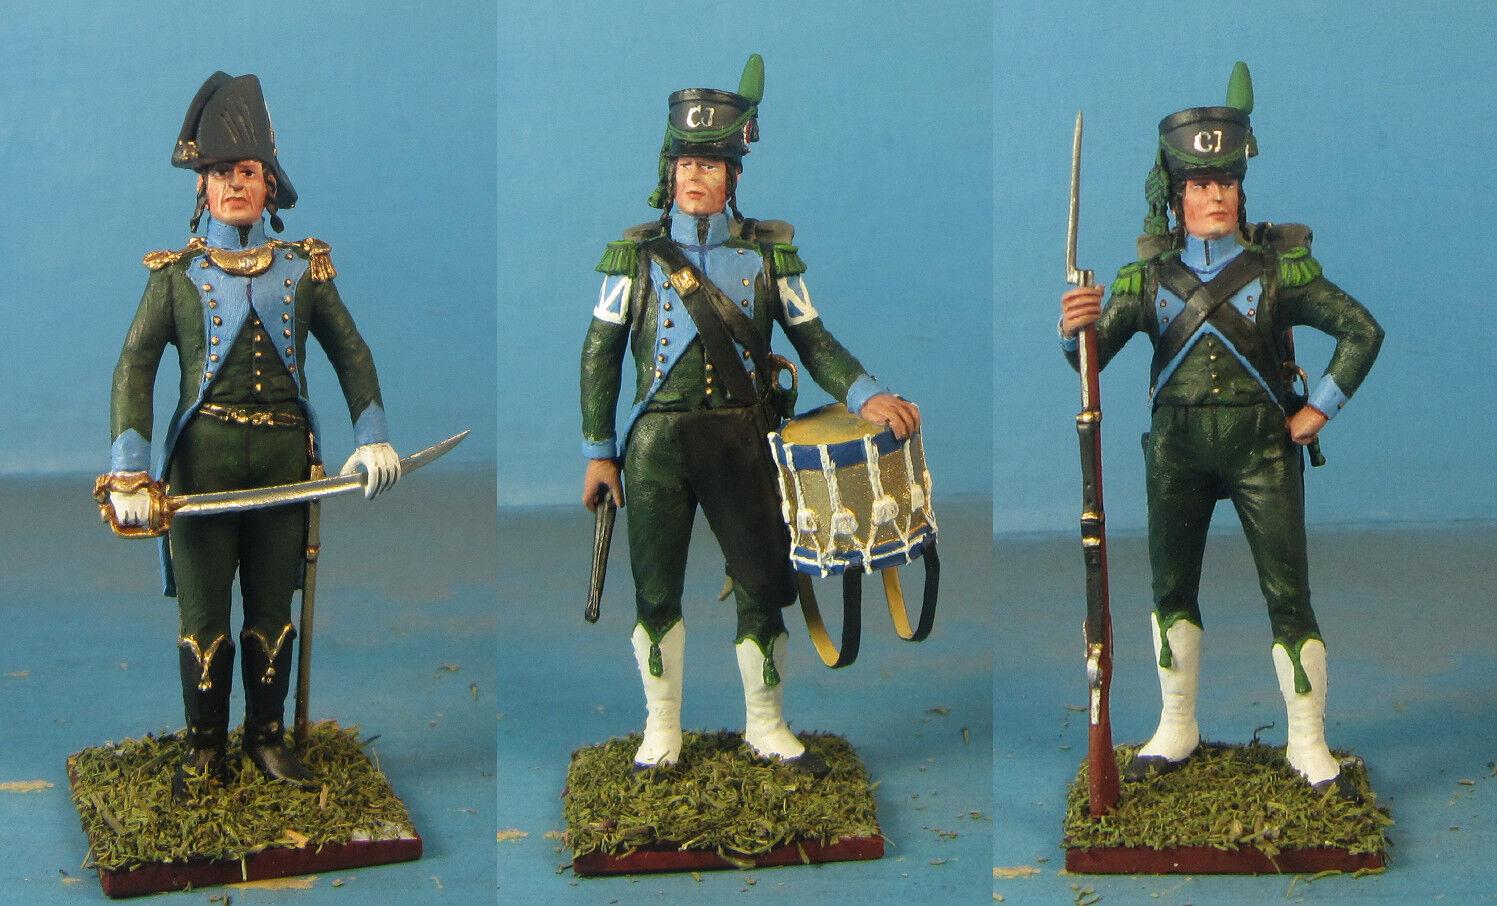 Napoleonic Wars — Holland Israelite corps — 60mm High quality Metal Figure